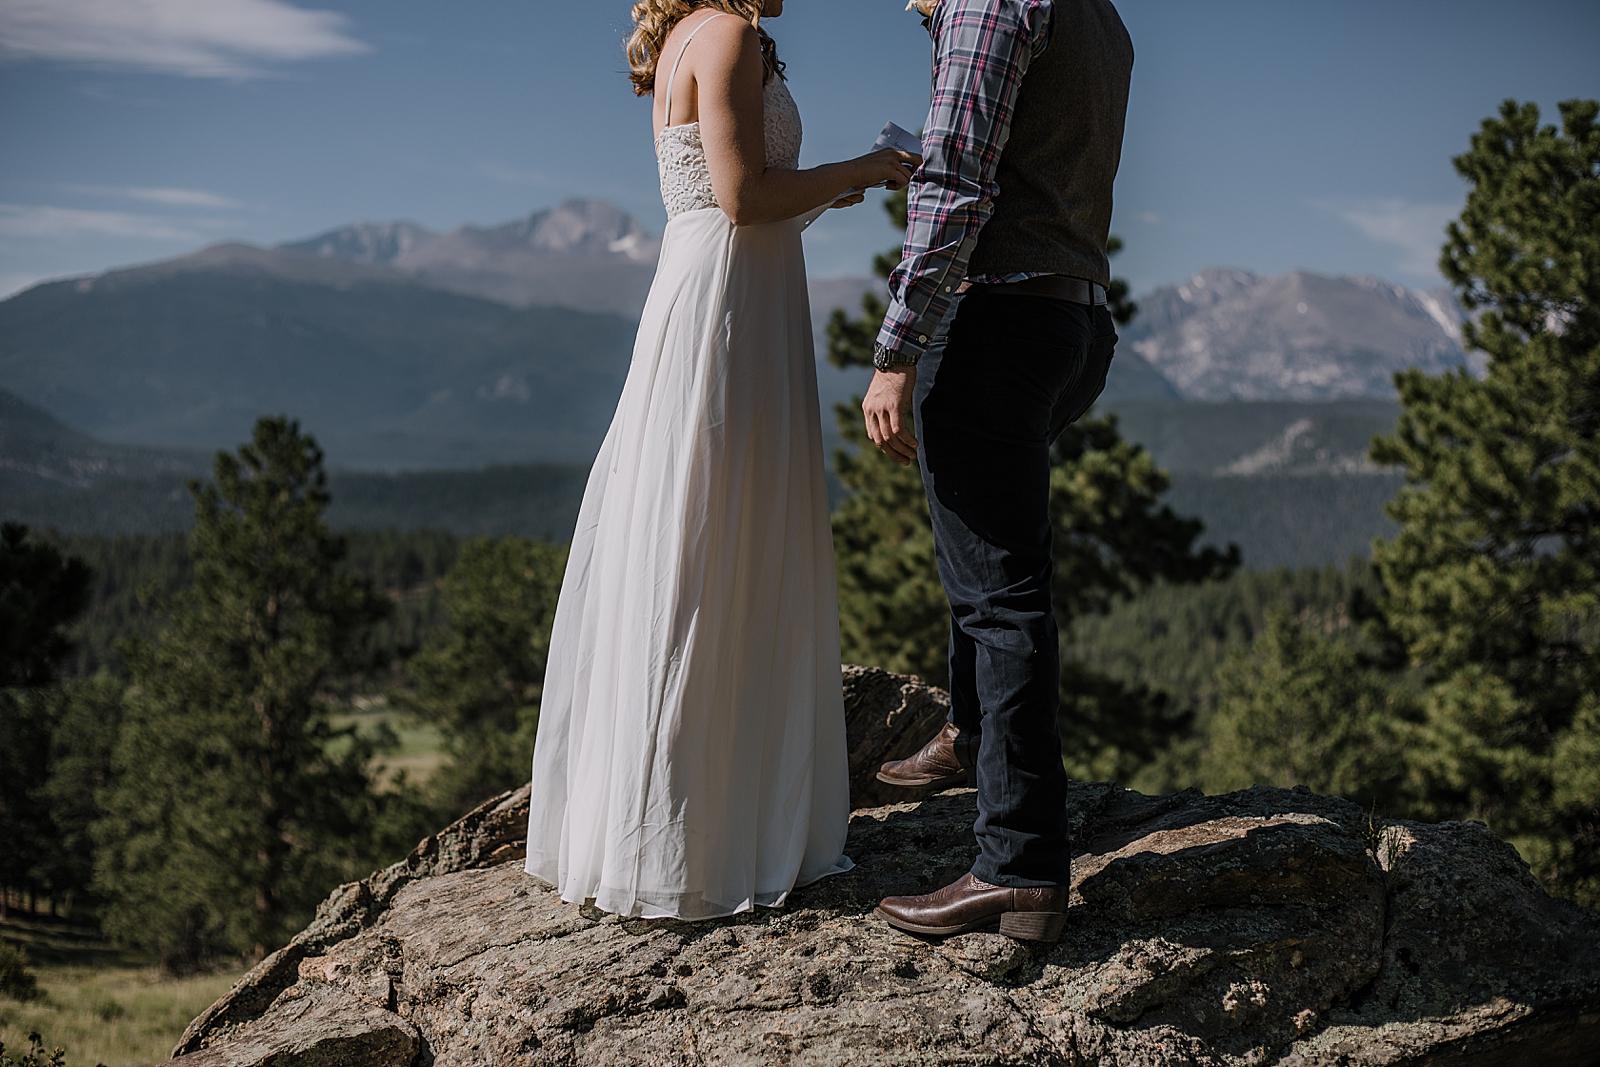 RMNP elopement ceremony, rocky mountain national park elopement, 3M curves elopement, self solemnizing, self solemnization, long's peak ceremony, hiking elopement, estes park elopement